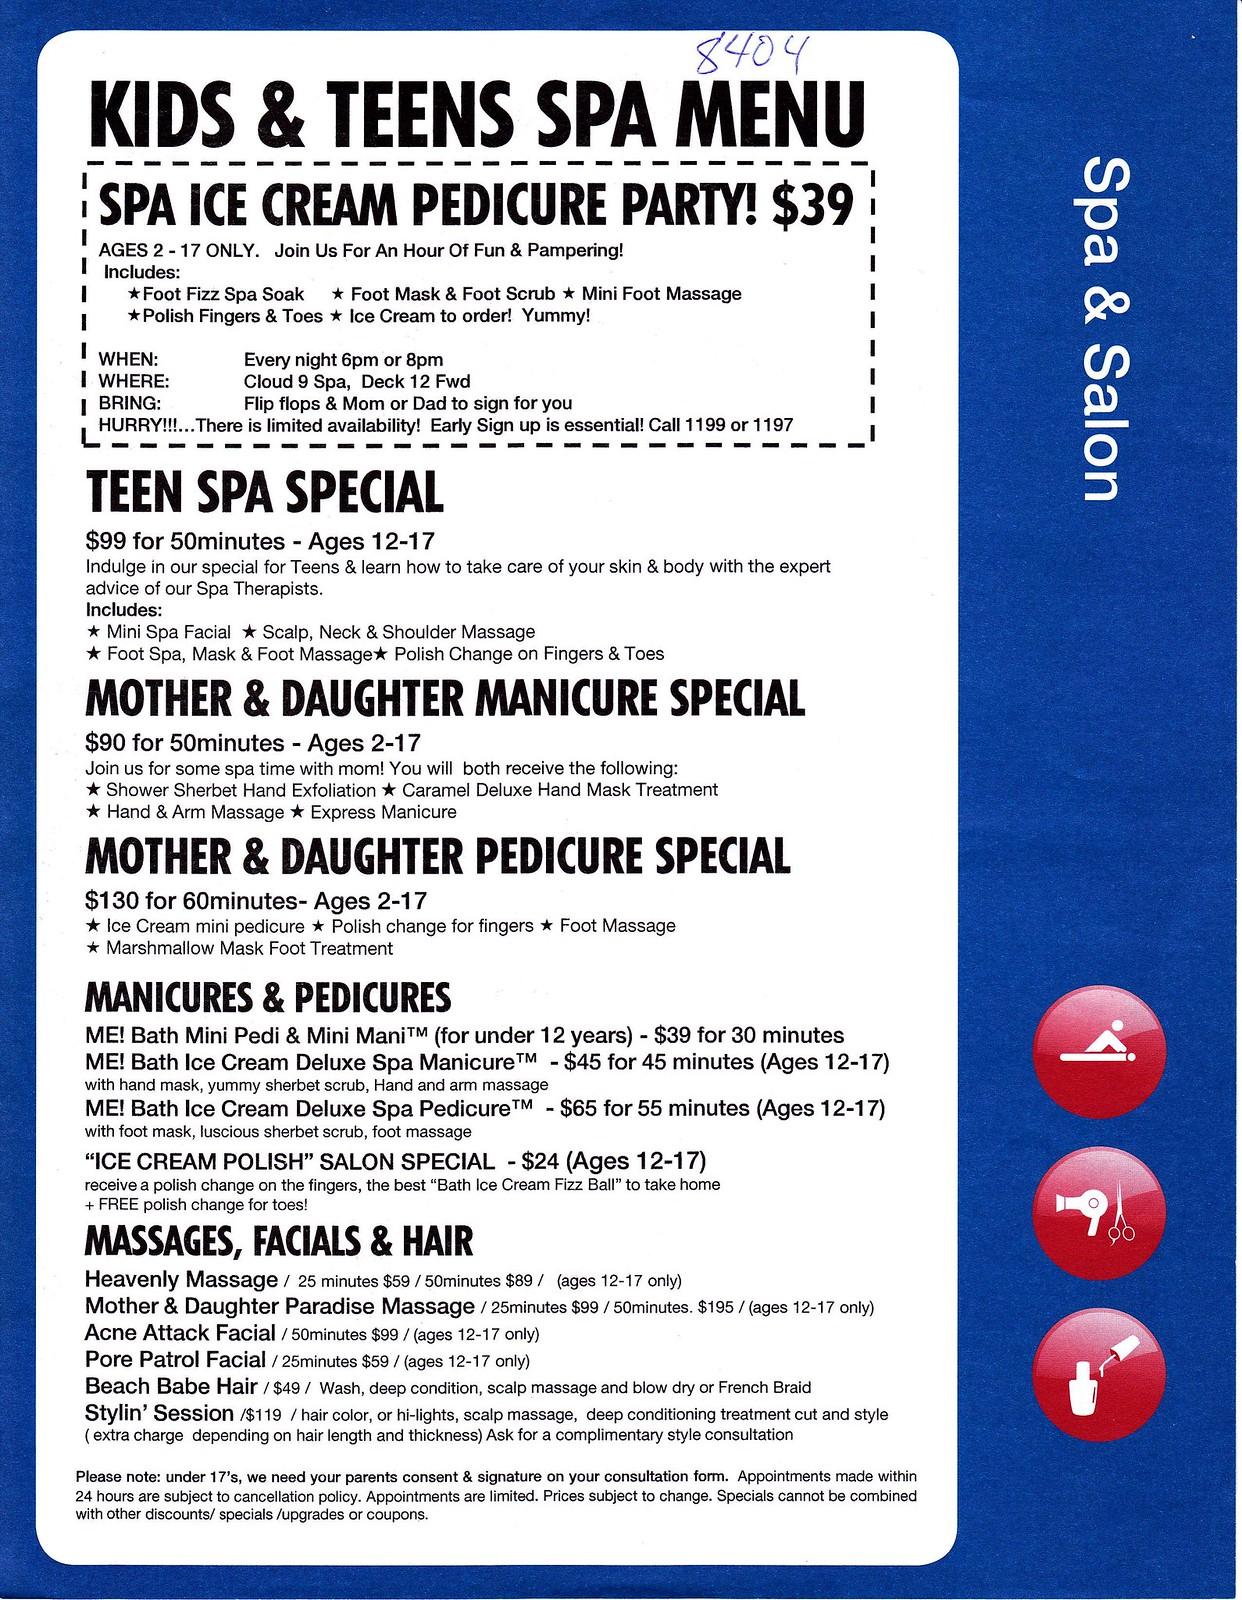 Spa W My 10 Yo Cruise Critic Message Board Forums